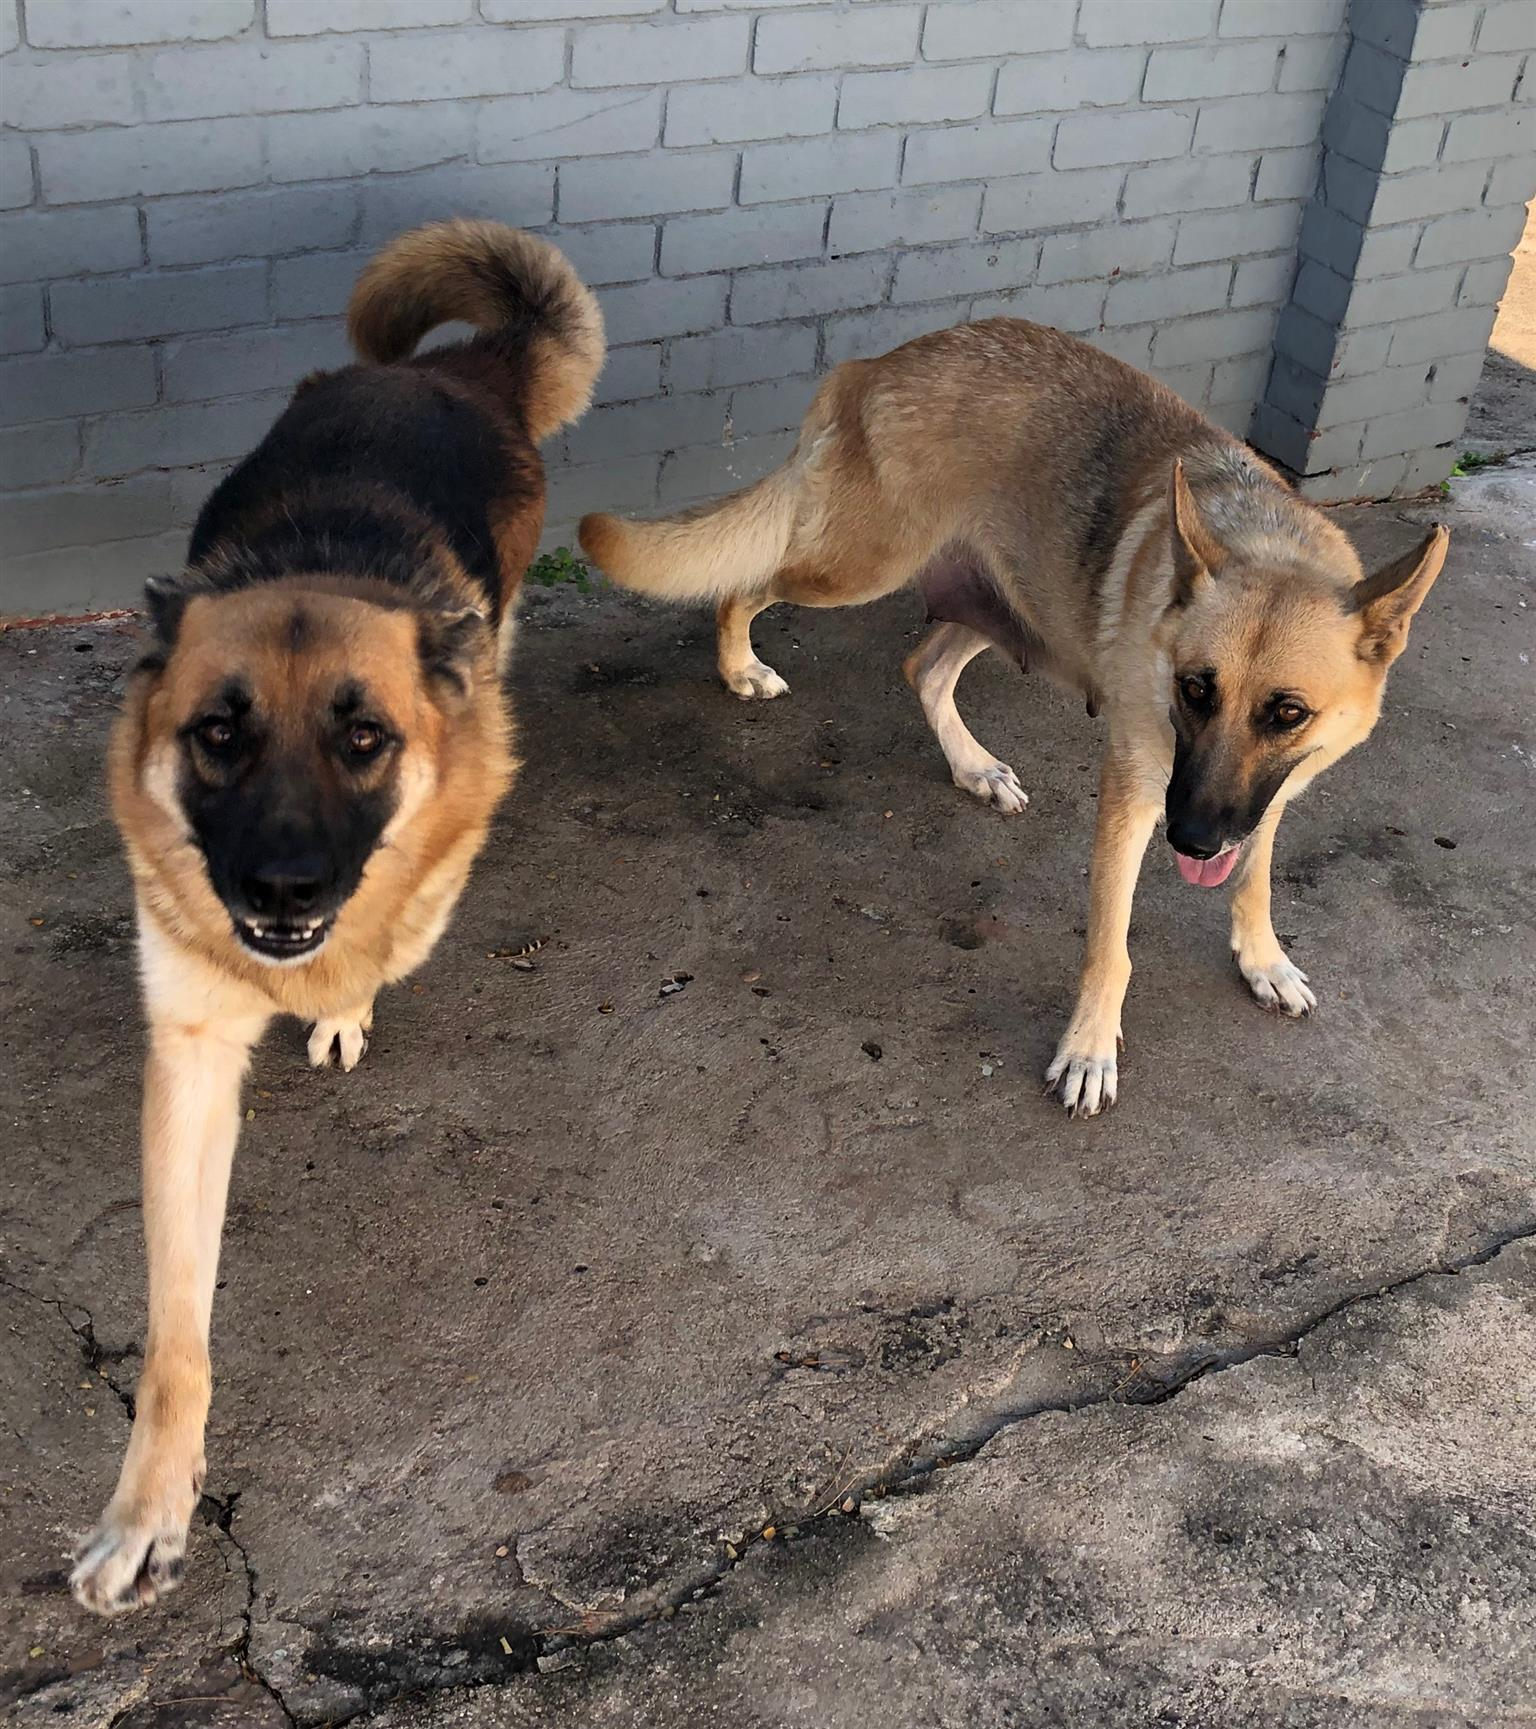 Thorough bred German Shepherd puppies for sale